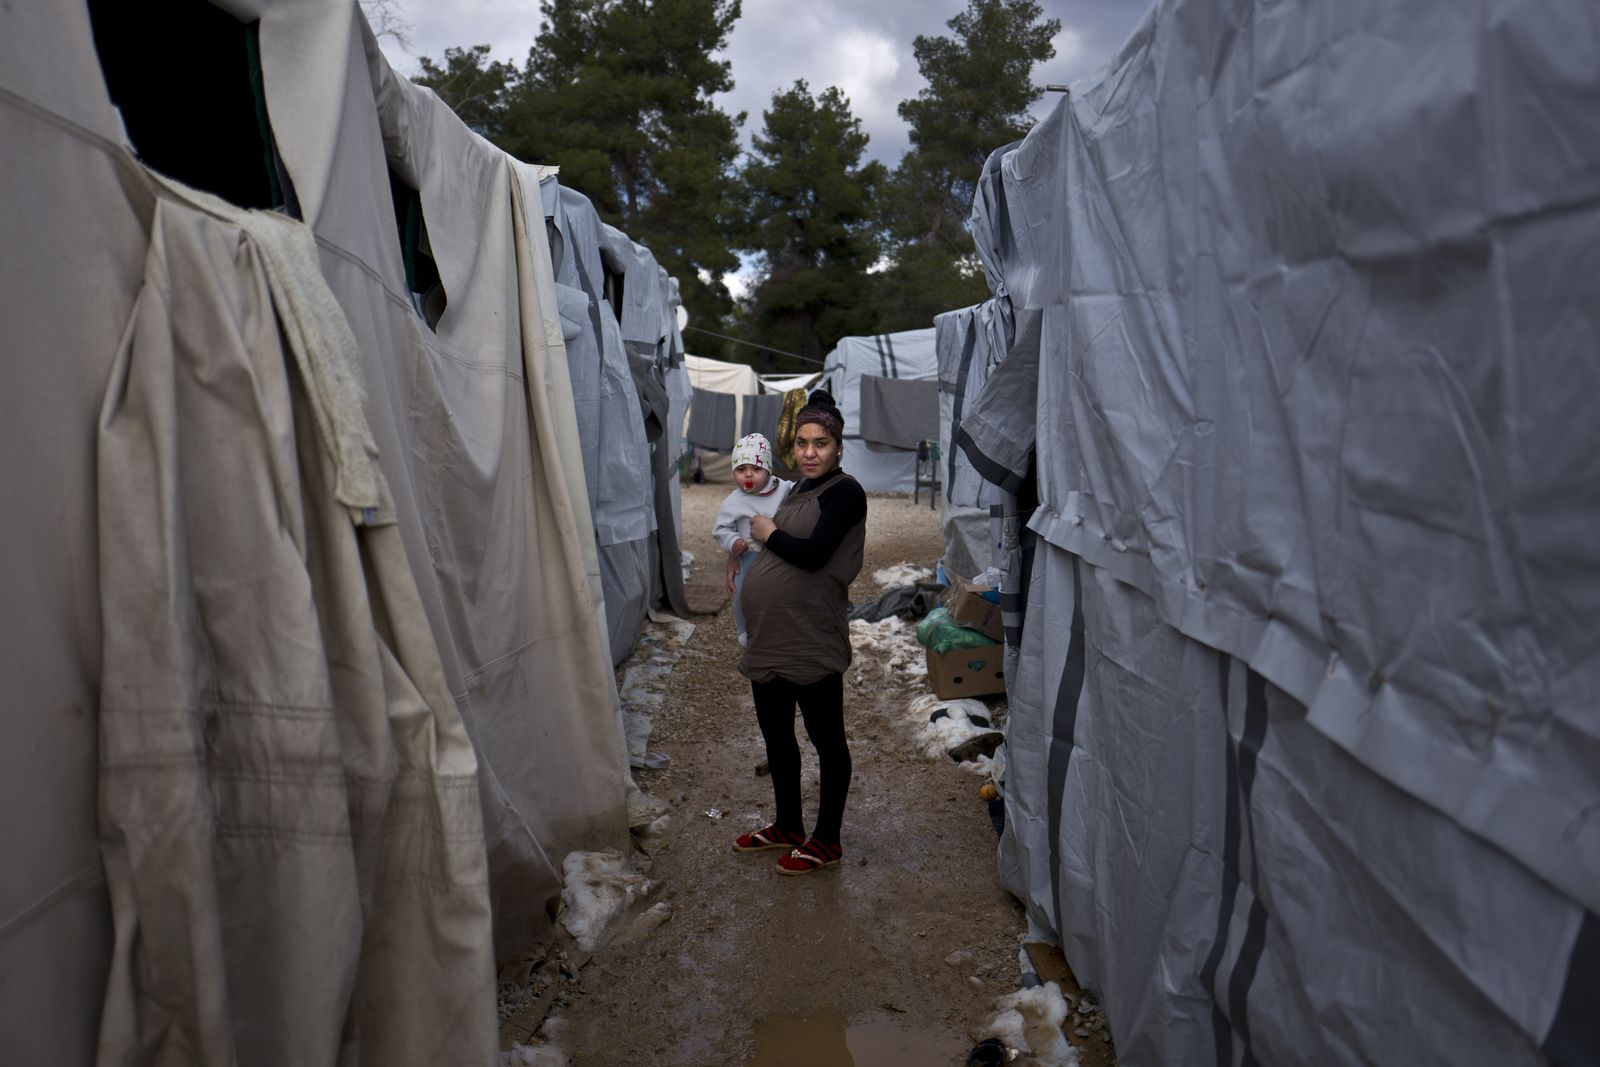 Griechenland / Flüchtlinge